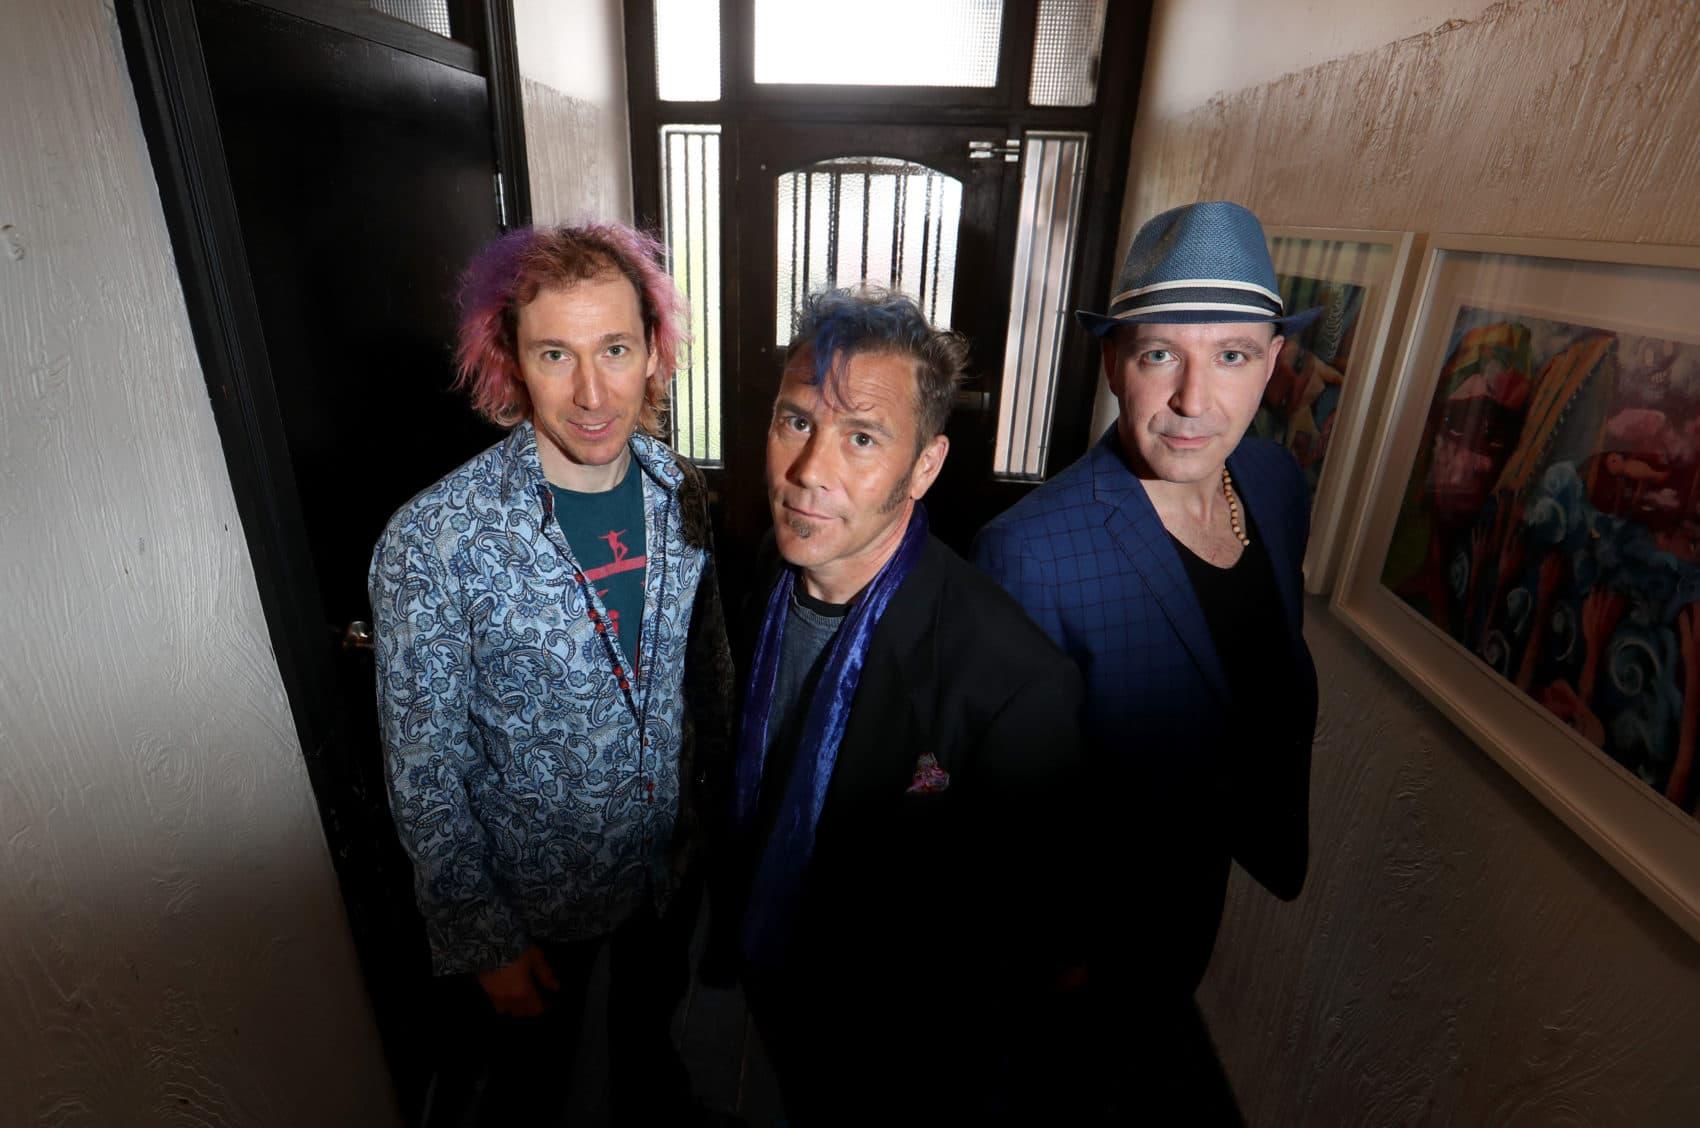 Kofi Baker, Will Johns and Malcolm Bruce at Bakehouse studios in Melbourne. (Courtesy David Geraghty/The Australian)